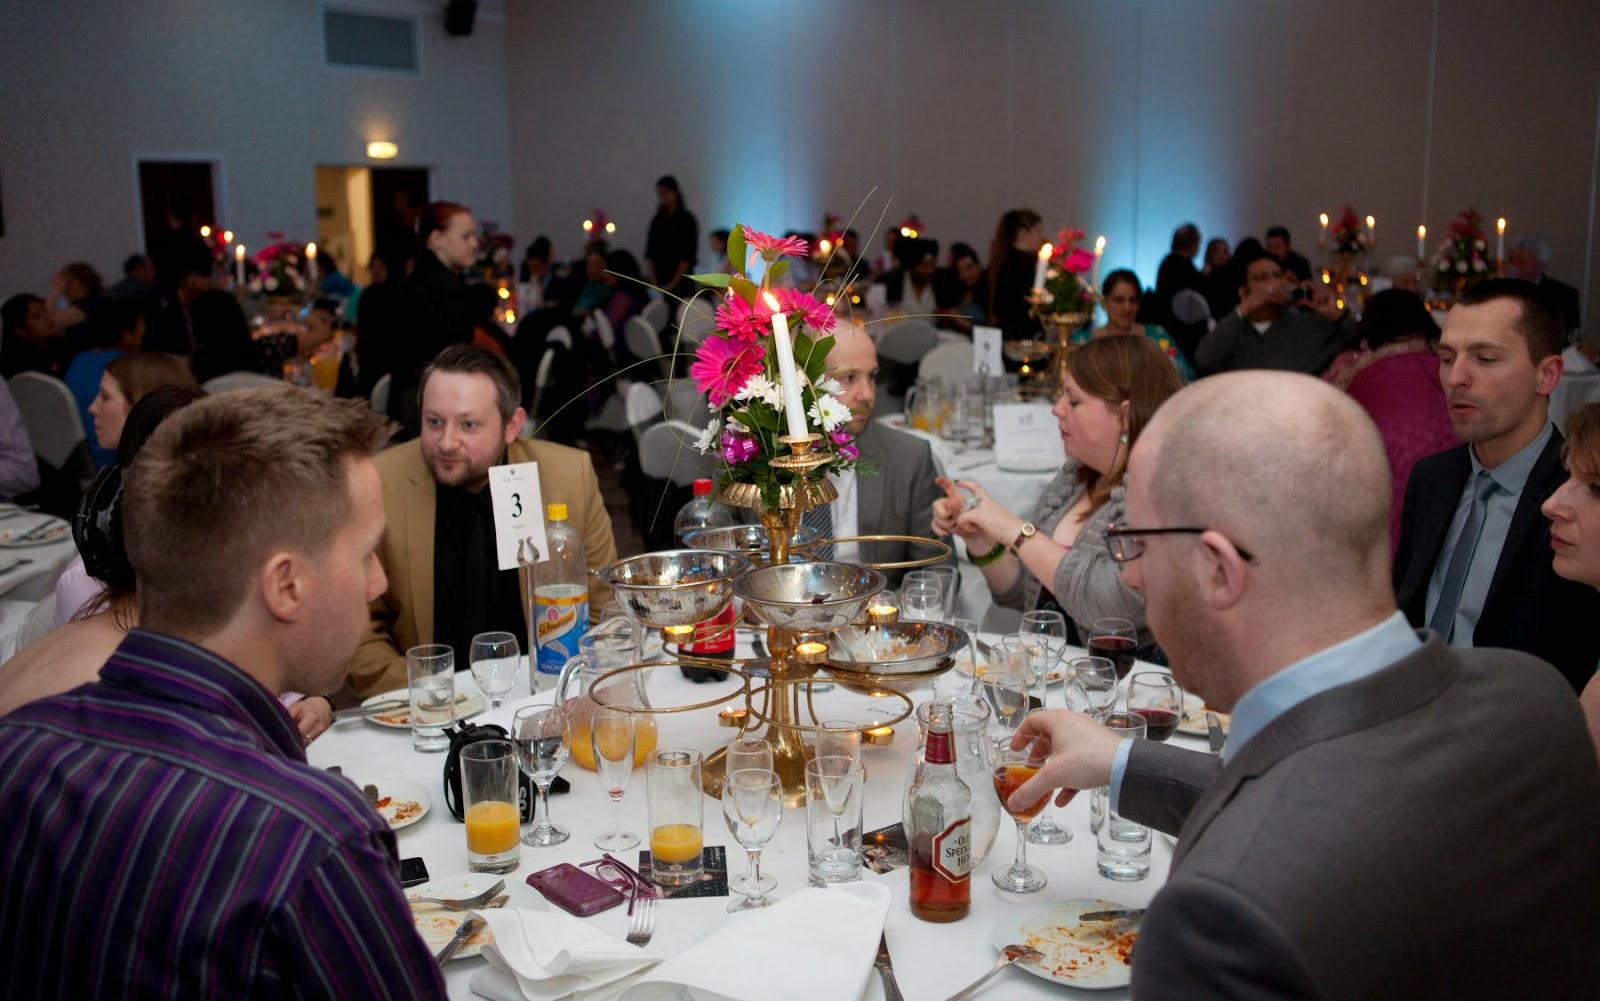 Wedding Venues In Kent December 2014